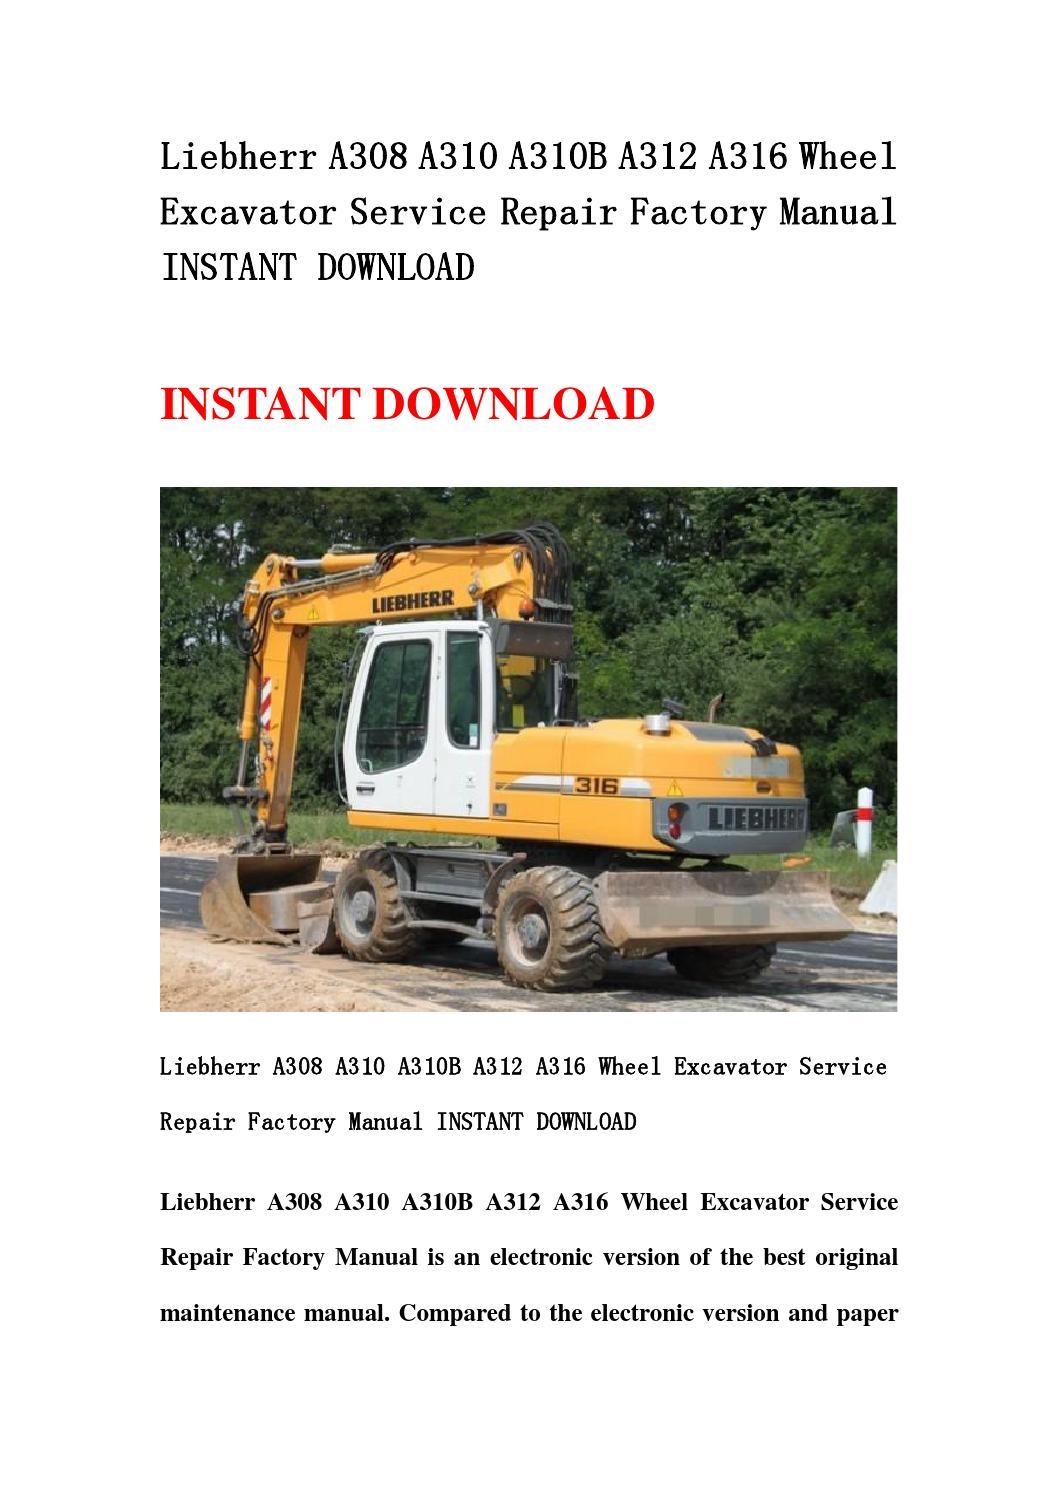 Liebherr A308 A310 A310b A312 A316 Wheel Excavator Service